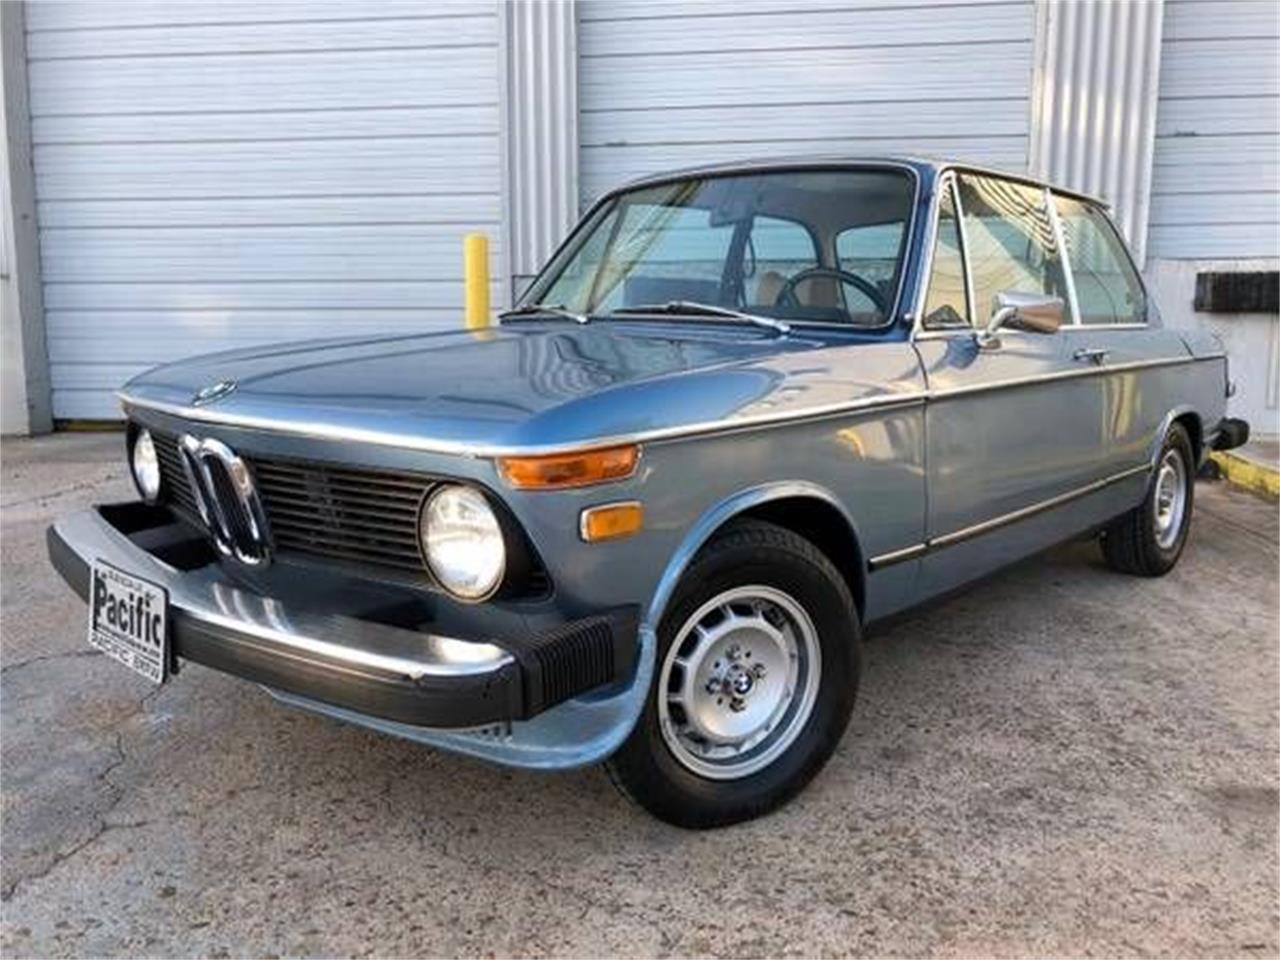 BMW 2002 For Sale >> 1975 Bmw 2002 For Sale In Cadillac Mi Classiccarsbay Com